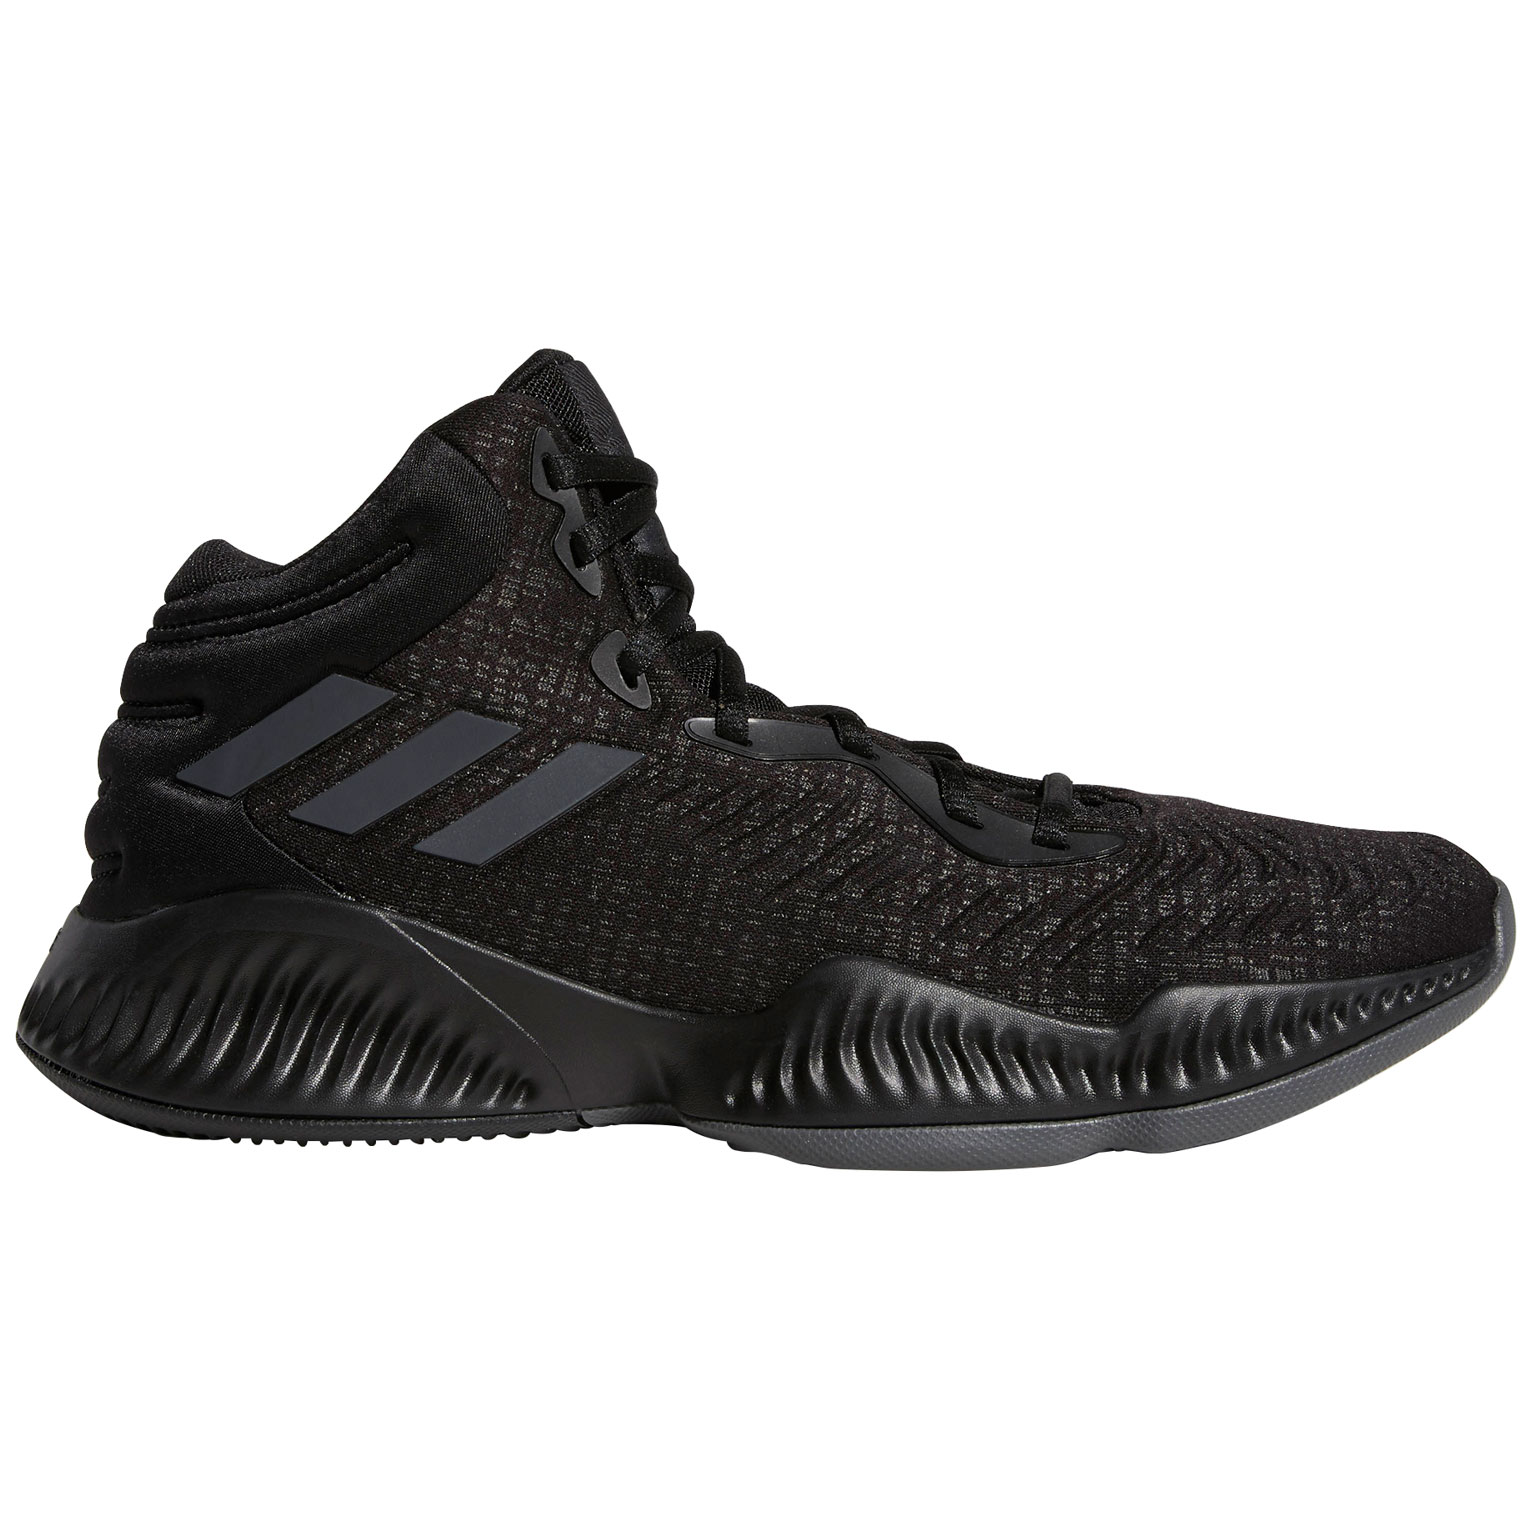 ADIDAS BASKETBALL HERRENSCHUHE Crazy Bounce Sneaker Übergrössen Gr. 47 48